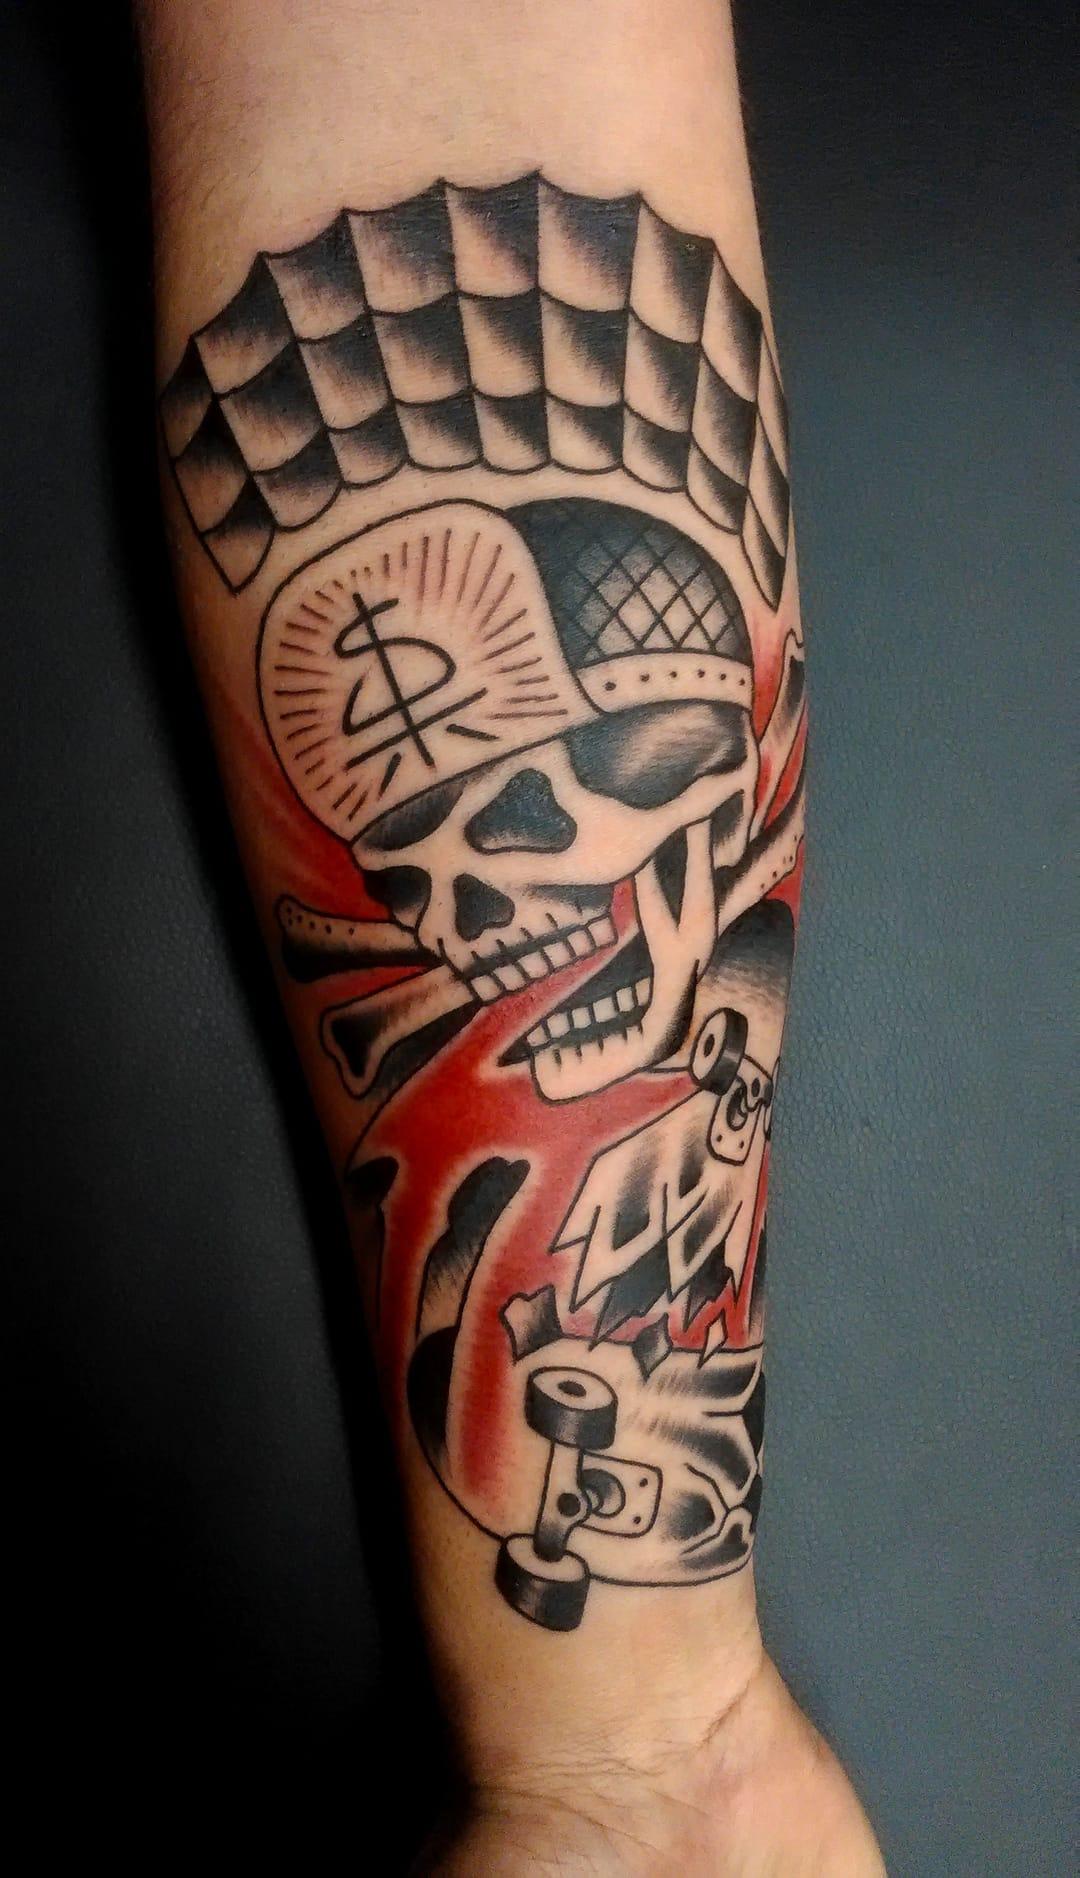 skate tattoo uma pictures to pin on pinterest tattooskid. Black Bedroom Furniture Sets. Home Design Ideas